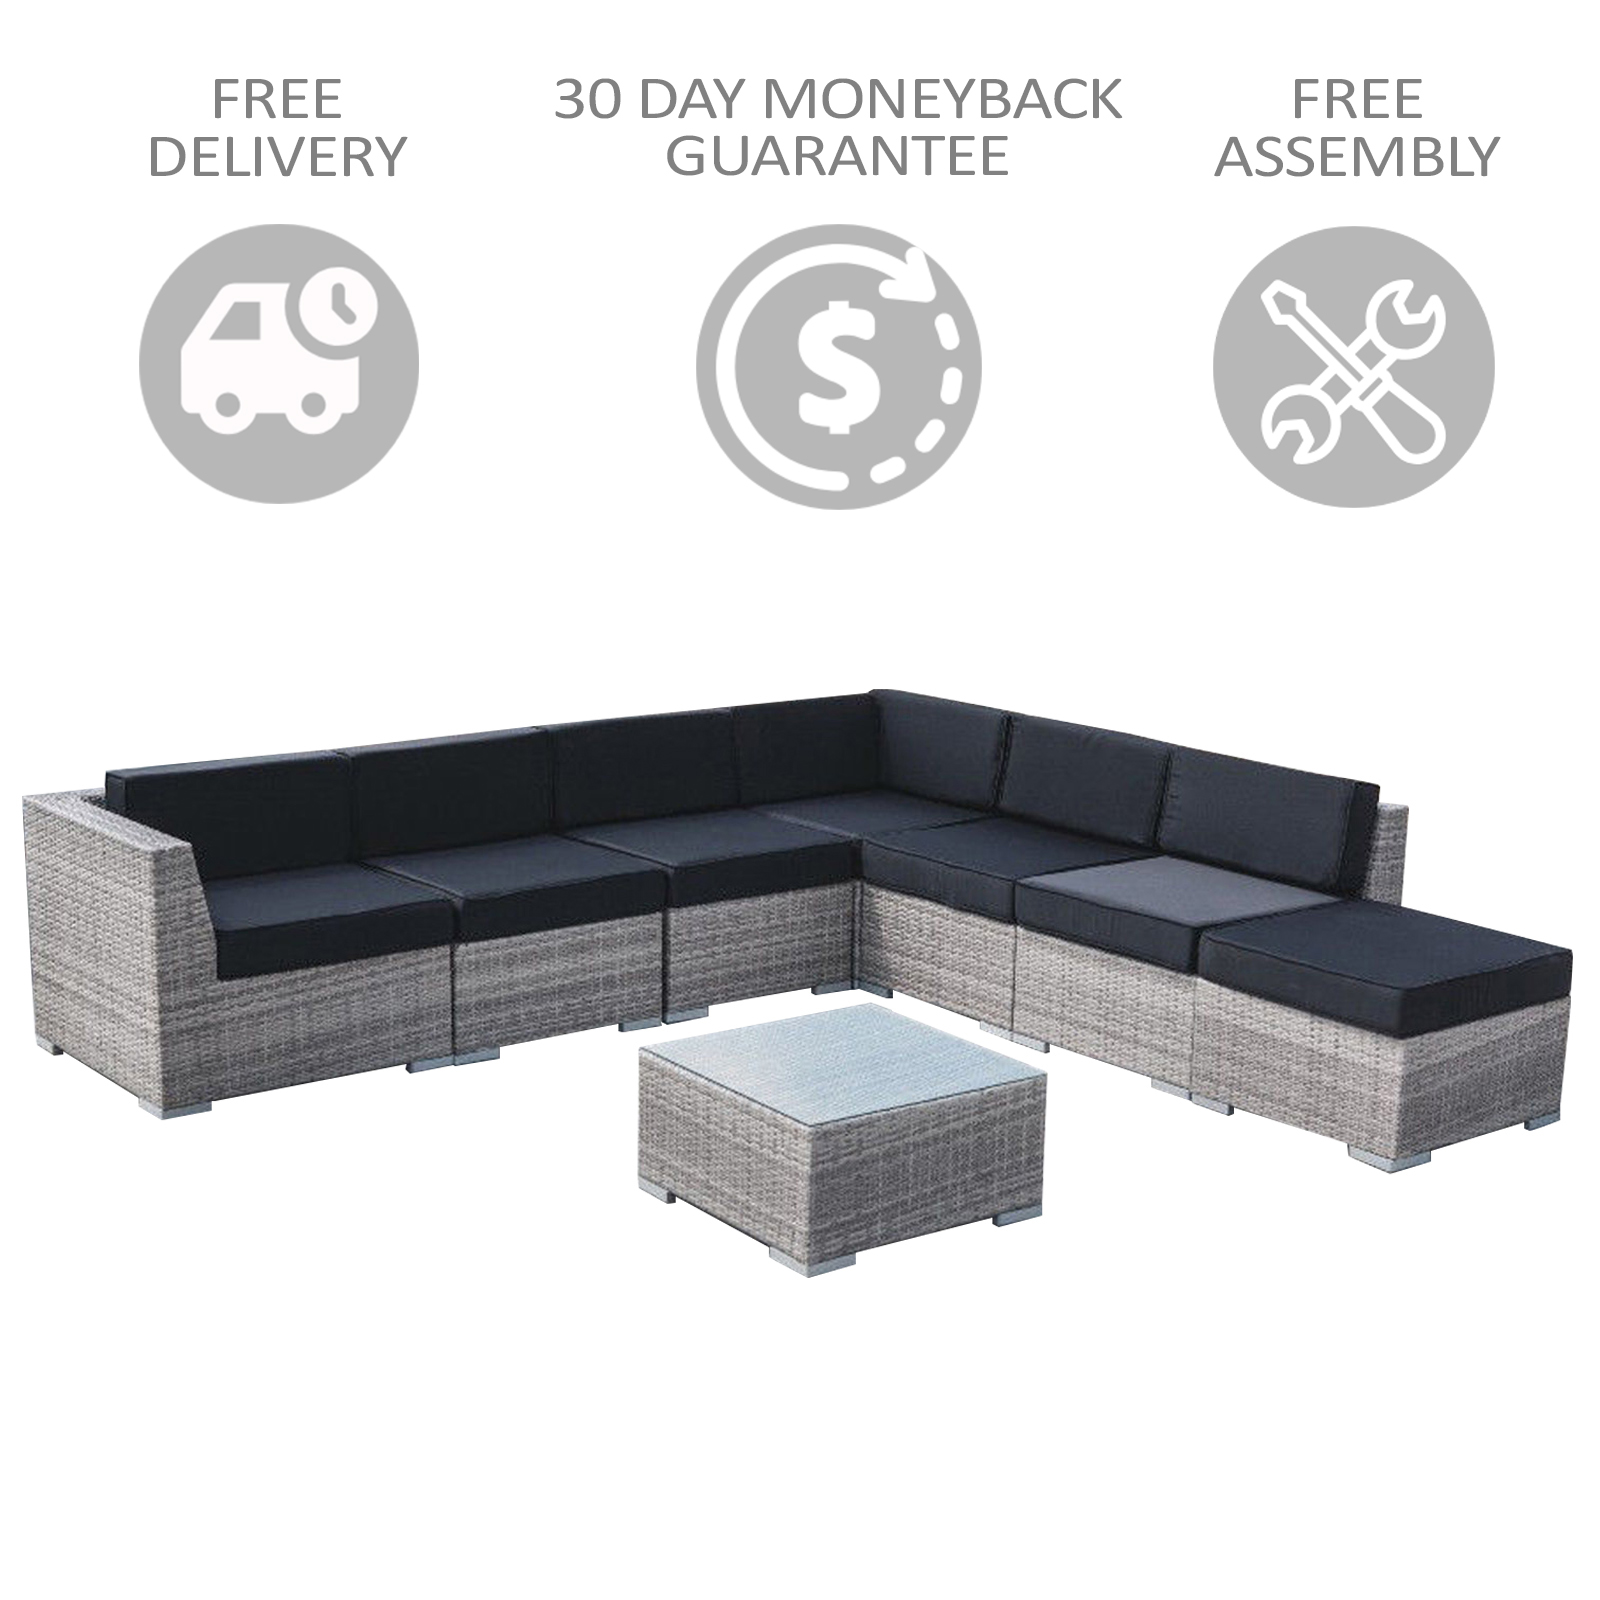 8 Piece New Wicker Rattan Garden Set Outdoor Sofa Lounge